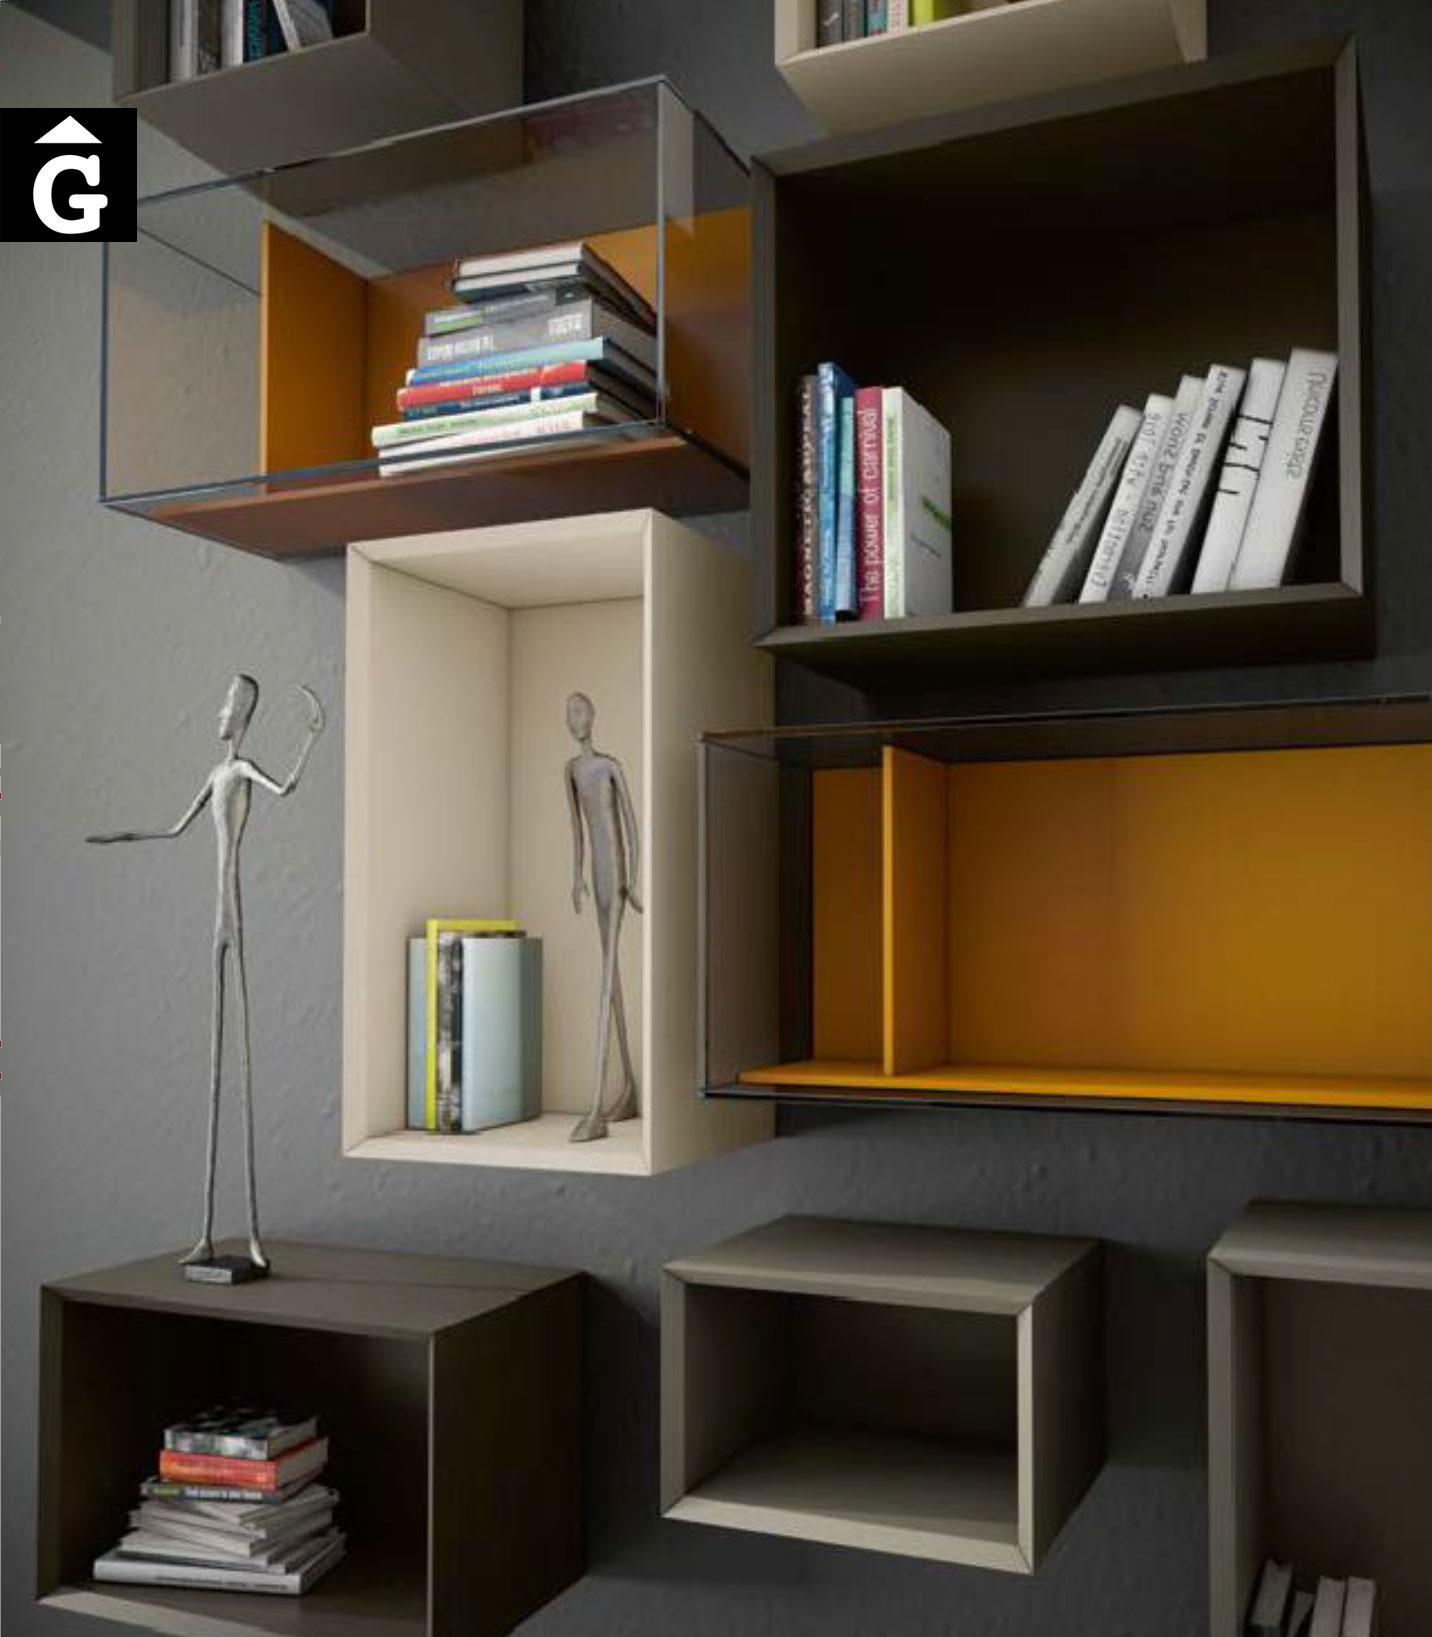 MOBLES-41-0-V-CONNECTOR-EMEDE-mobles-by-Mobles-GIFREU-Girona-ESPAI-EMEDE-Epacio-emede-Muebles-MD-moble-menjador-Sala-estar-habitatge-qualitat-laca-xapa-natural